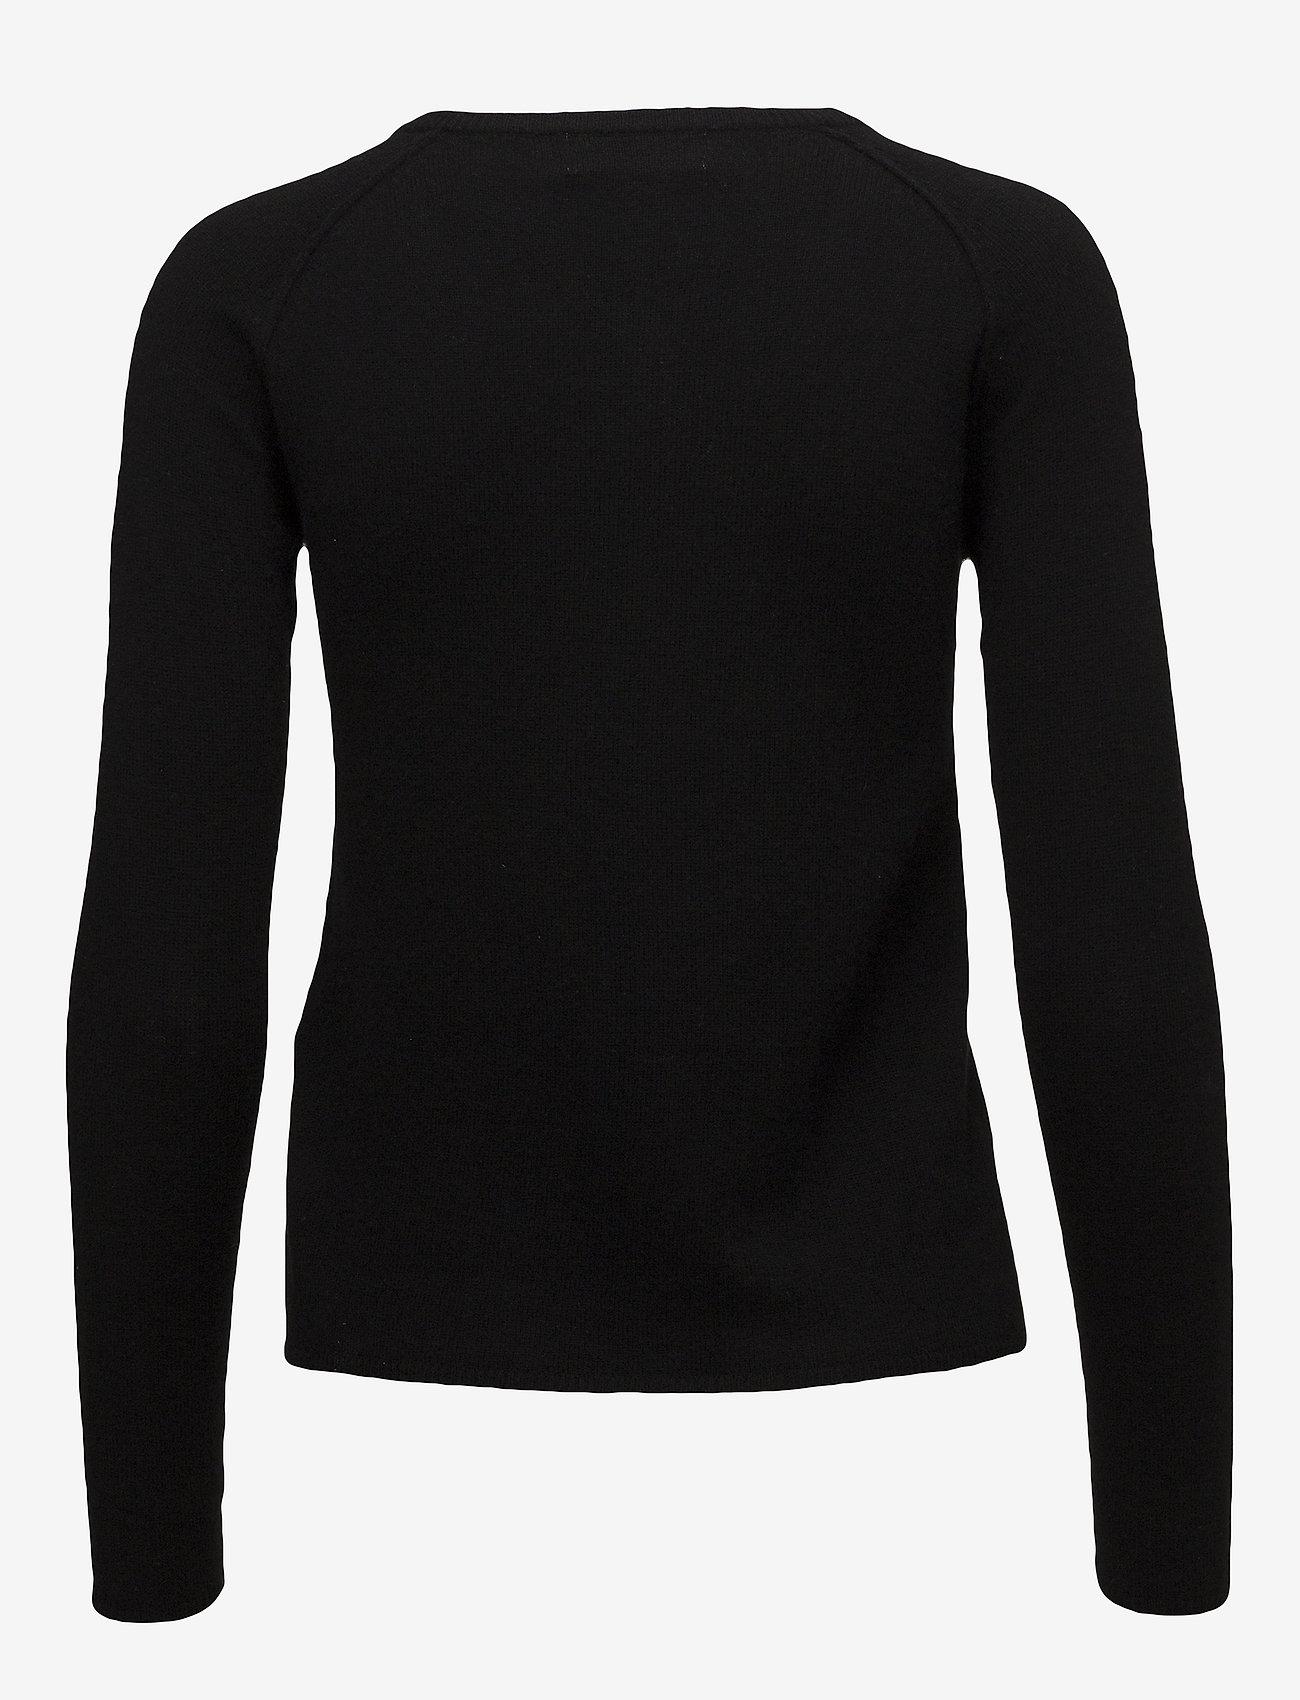 Rosemunde - Wool & cashmere cardigan ls - kashmir - black - 1